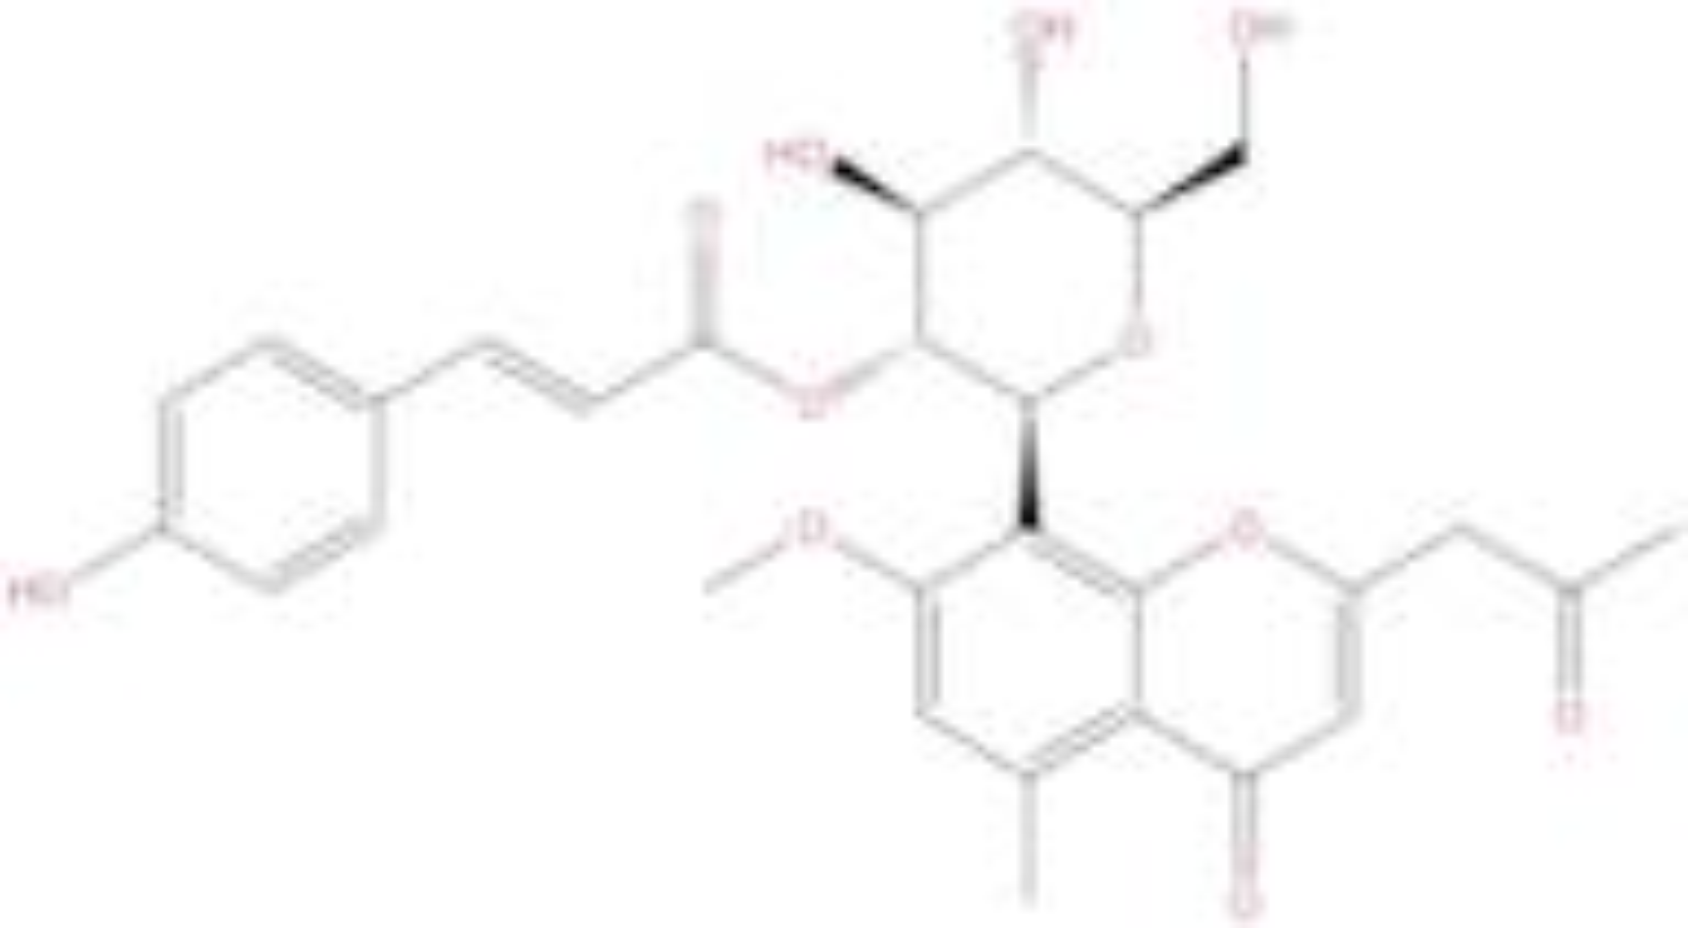 O-Methylaloeresin A, 7-